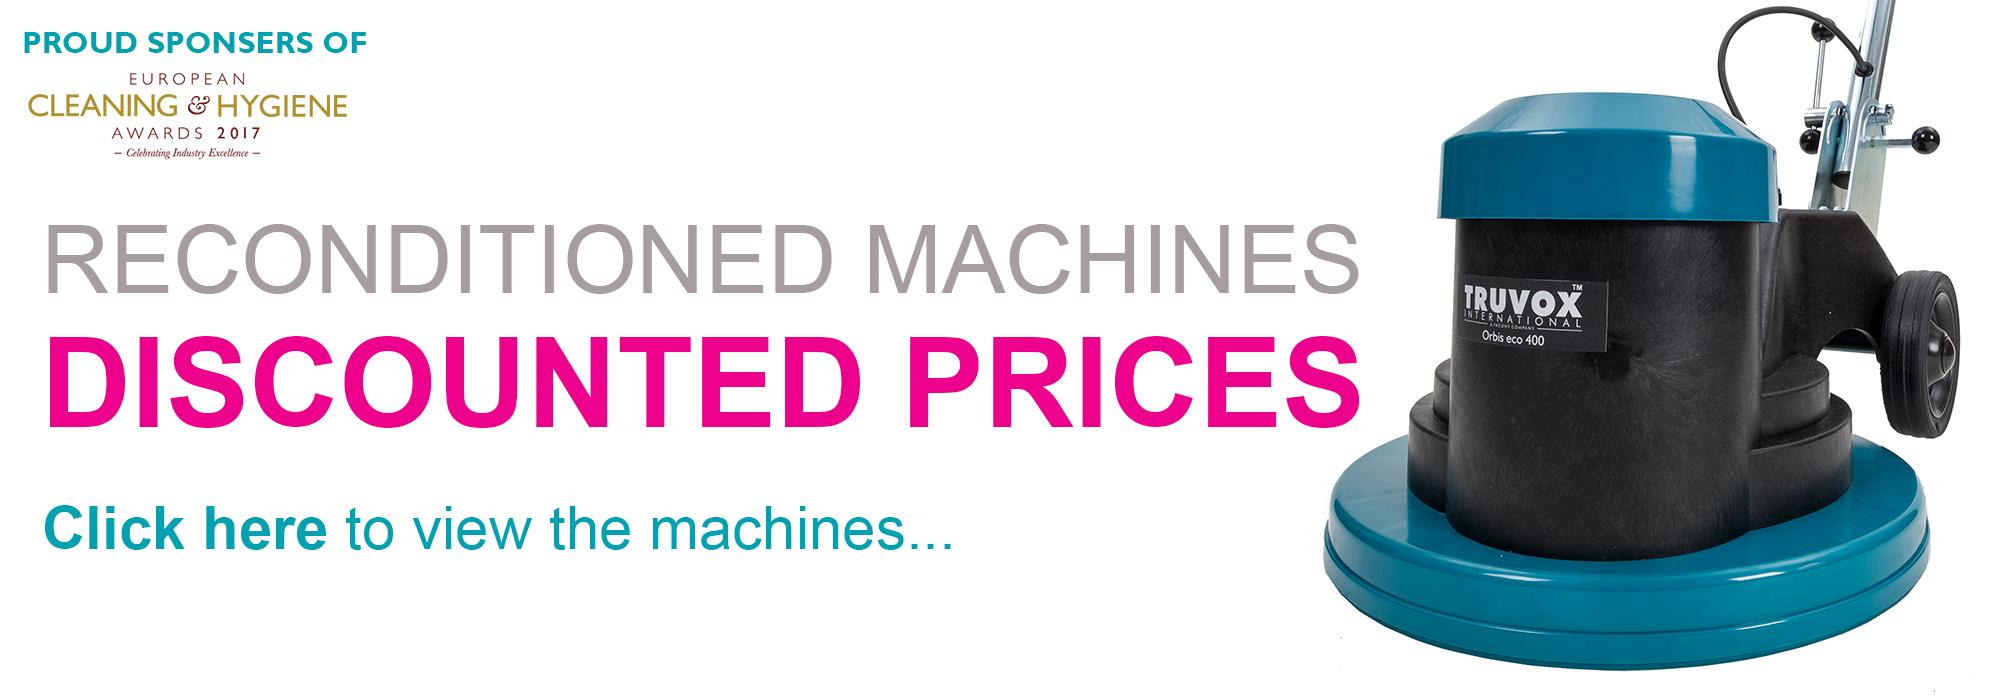 Truvox Reconditioned Machines